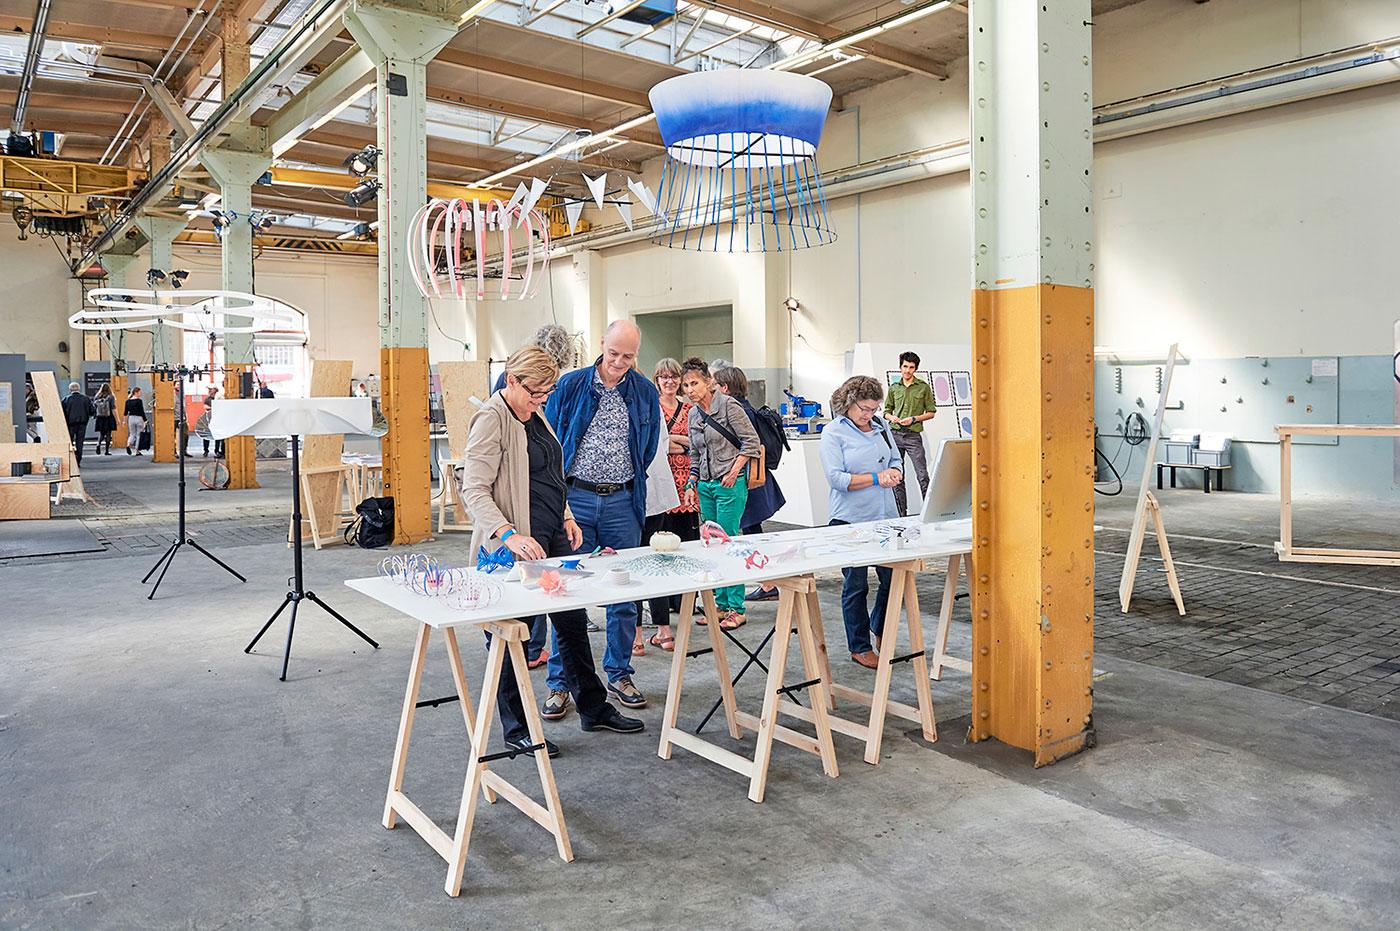 Design Biennale Zürich 2017, Drone Costumes, Lea Pereyre (Foto: Luca Zanier)